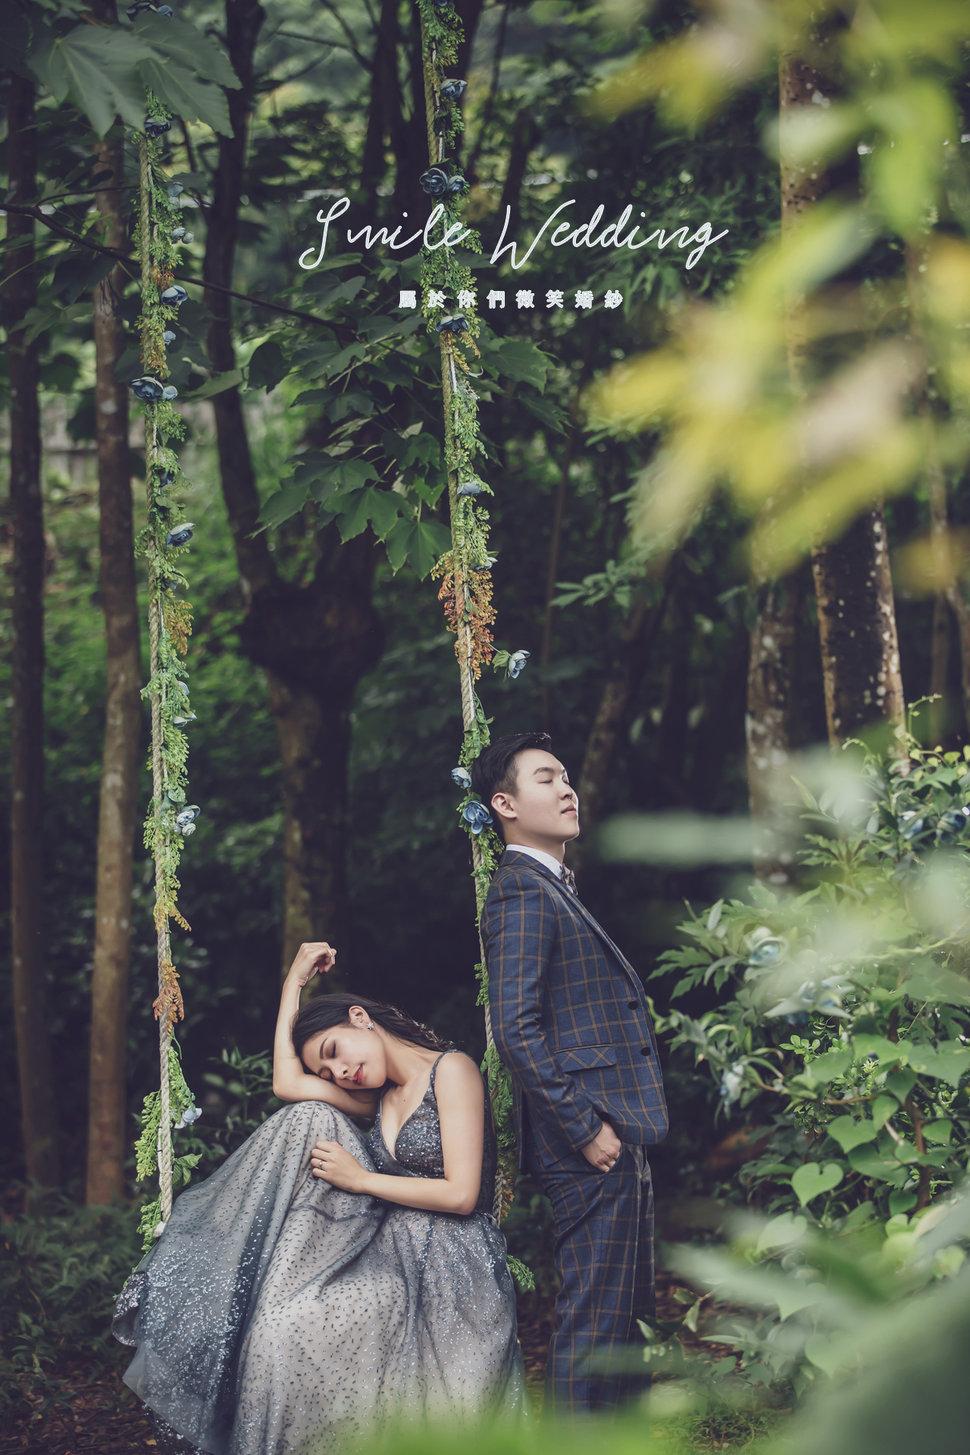 SIN_8737 - Smile wedding 微笑婚紗《結婚吧》